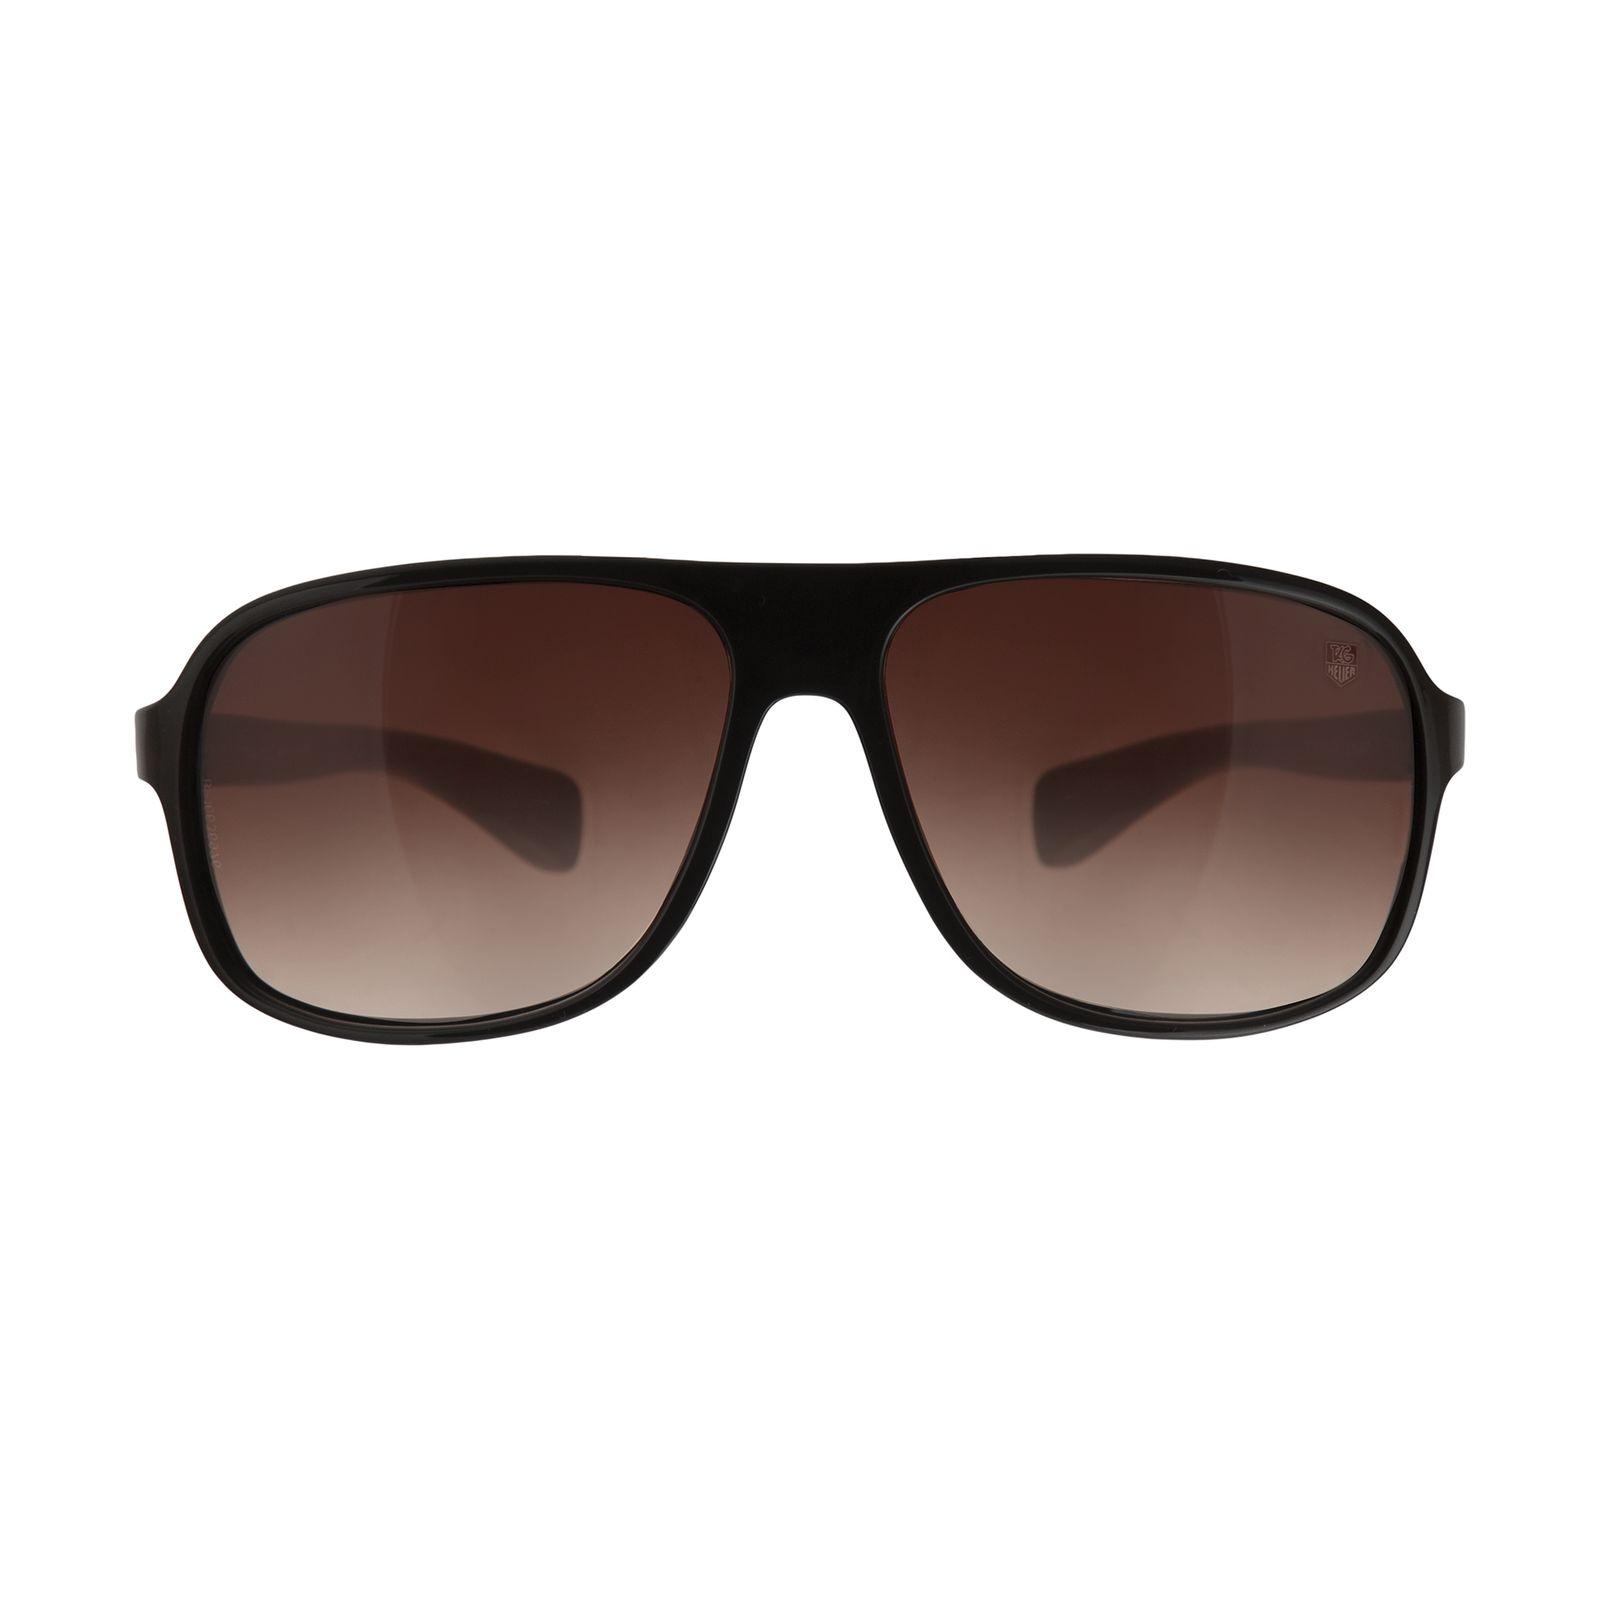 عینک آفتابی تگ هویر مدل 9301 -  - 2